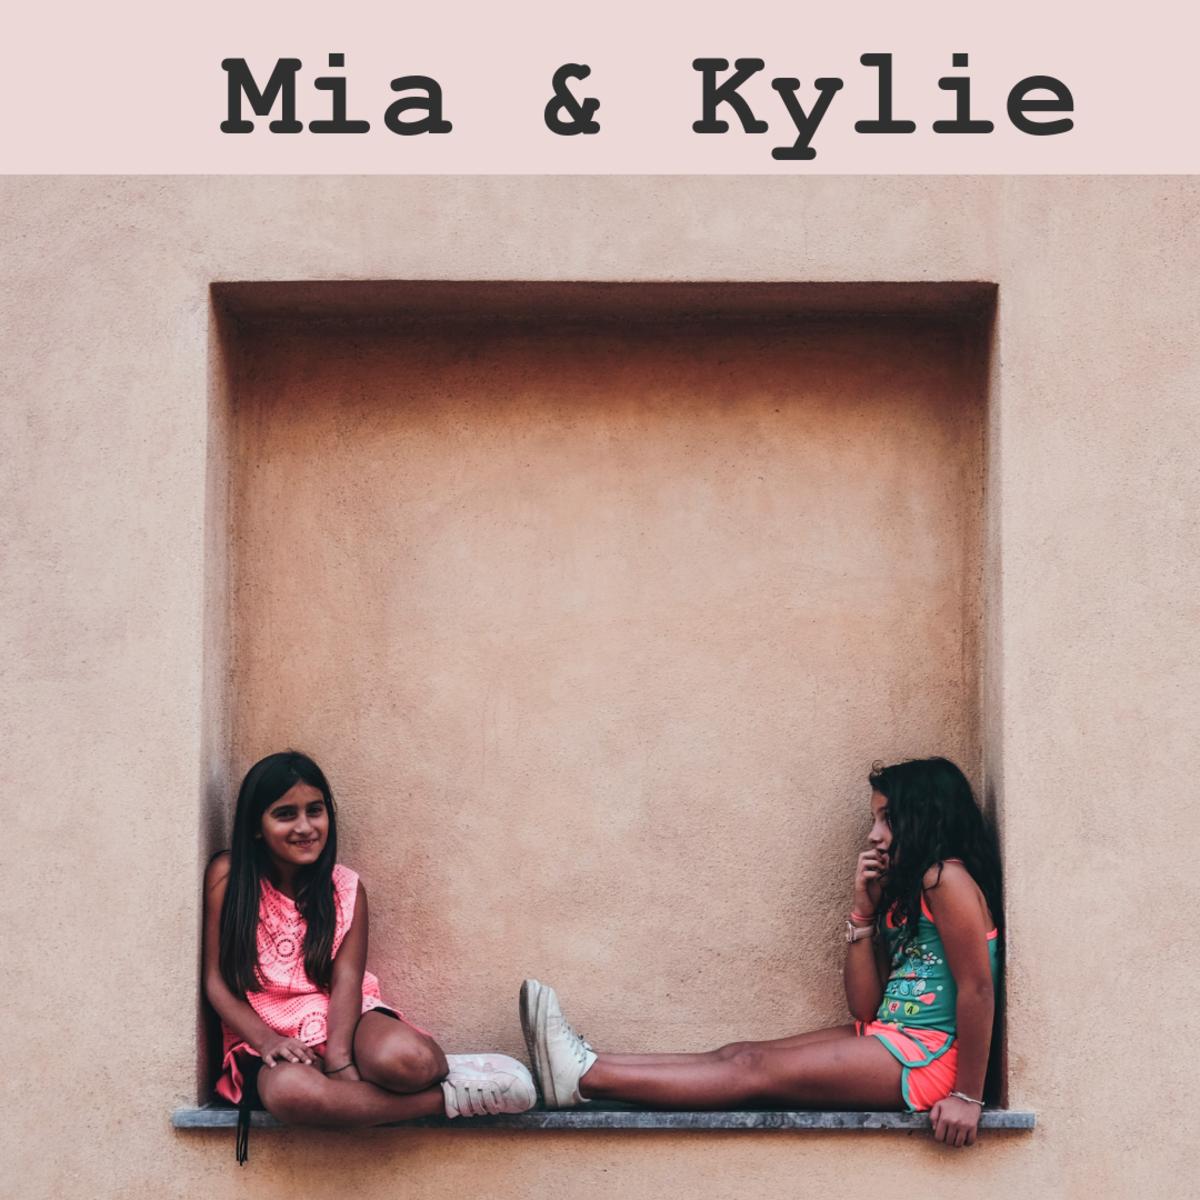 Mia & Kylie